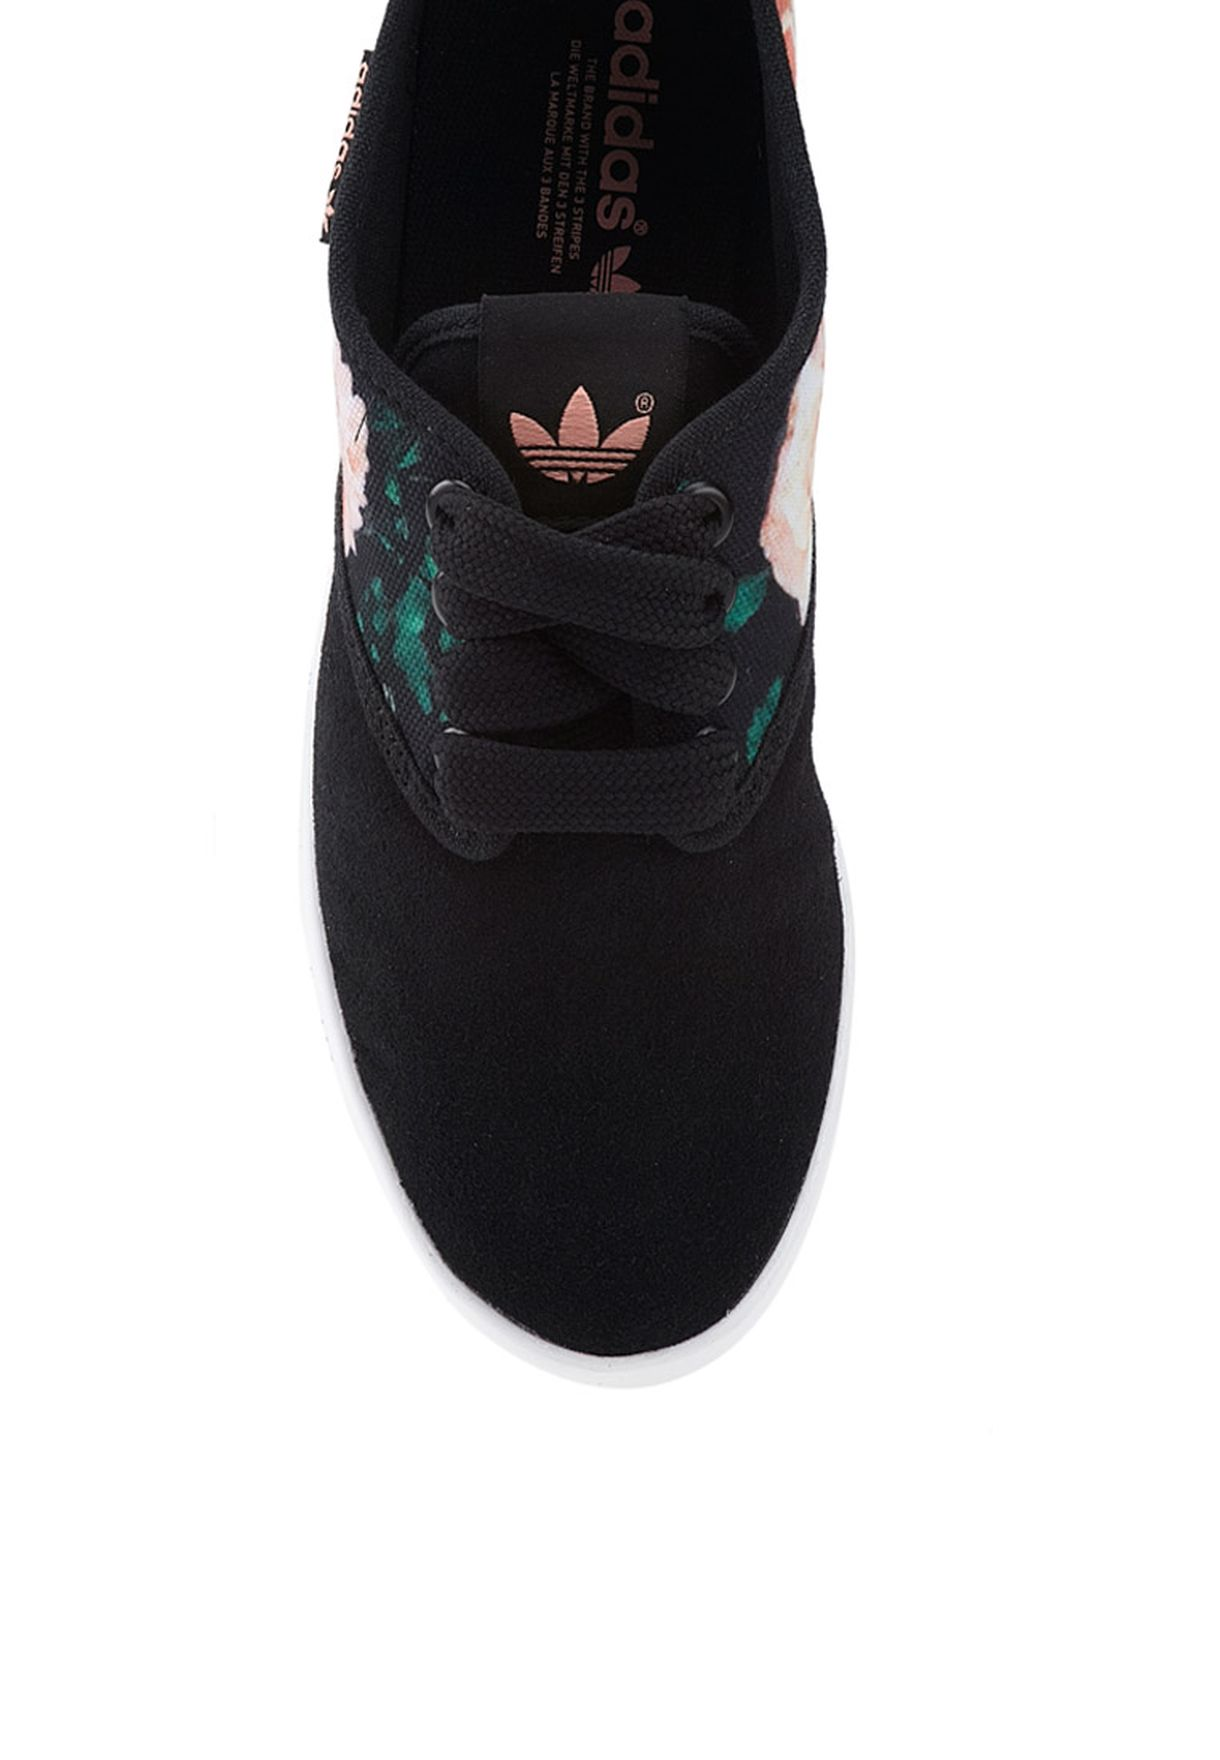 Adria PS 2Love Sneakers